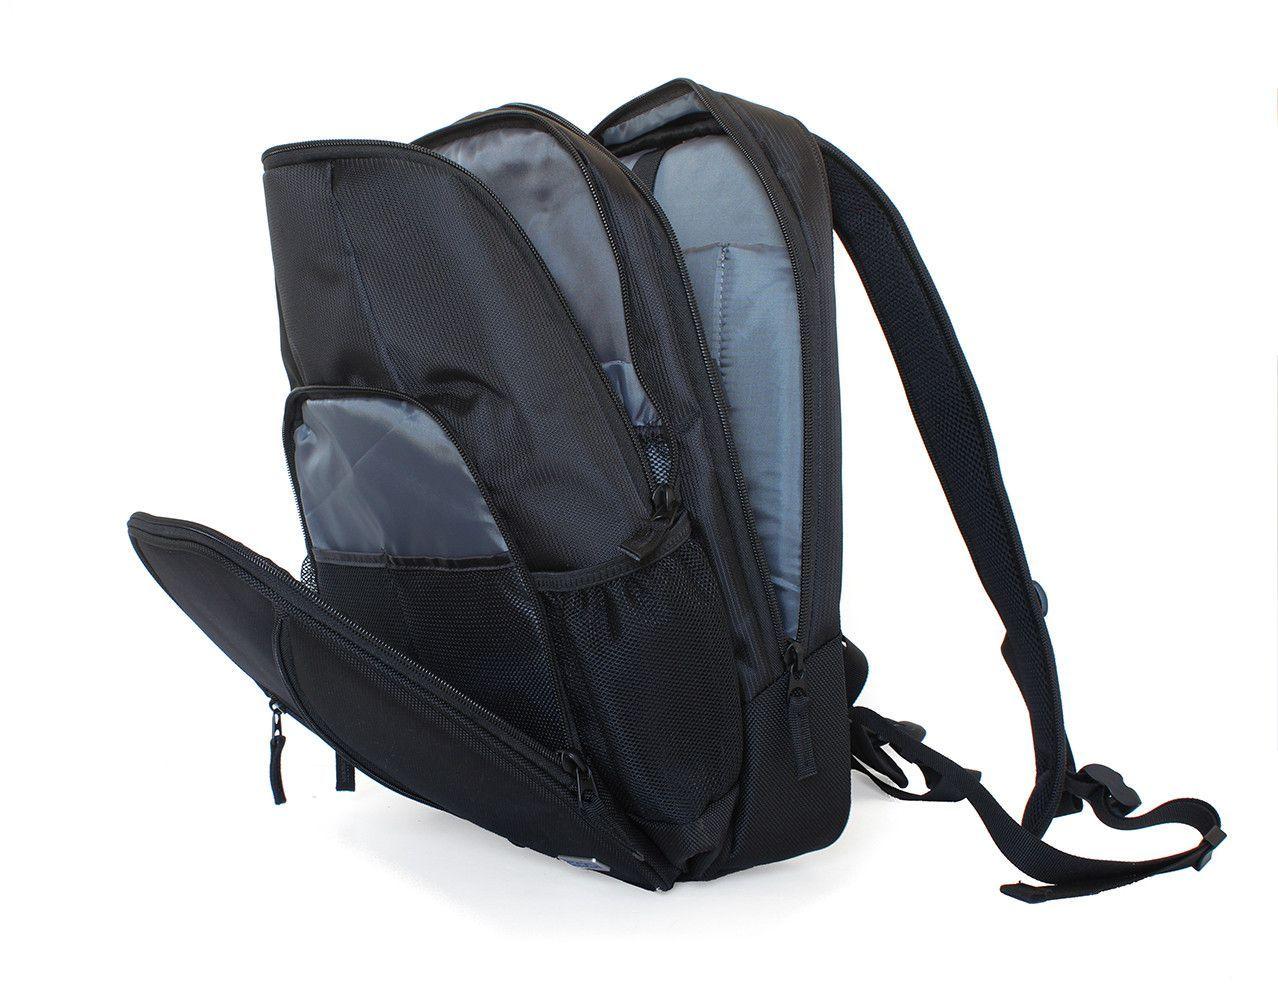 Codi Laptop Backpack | Backpacks, Laptop backpack, Laptop